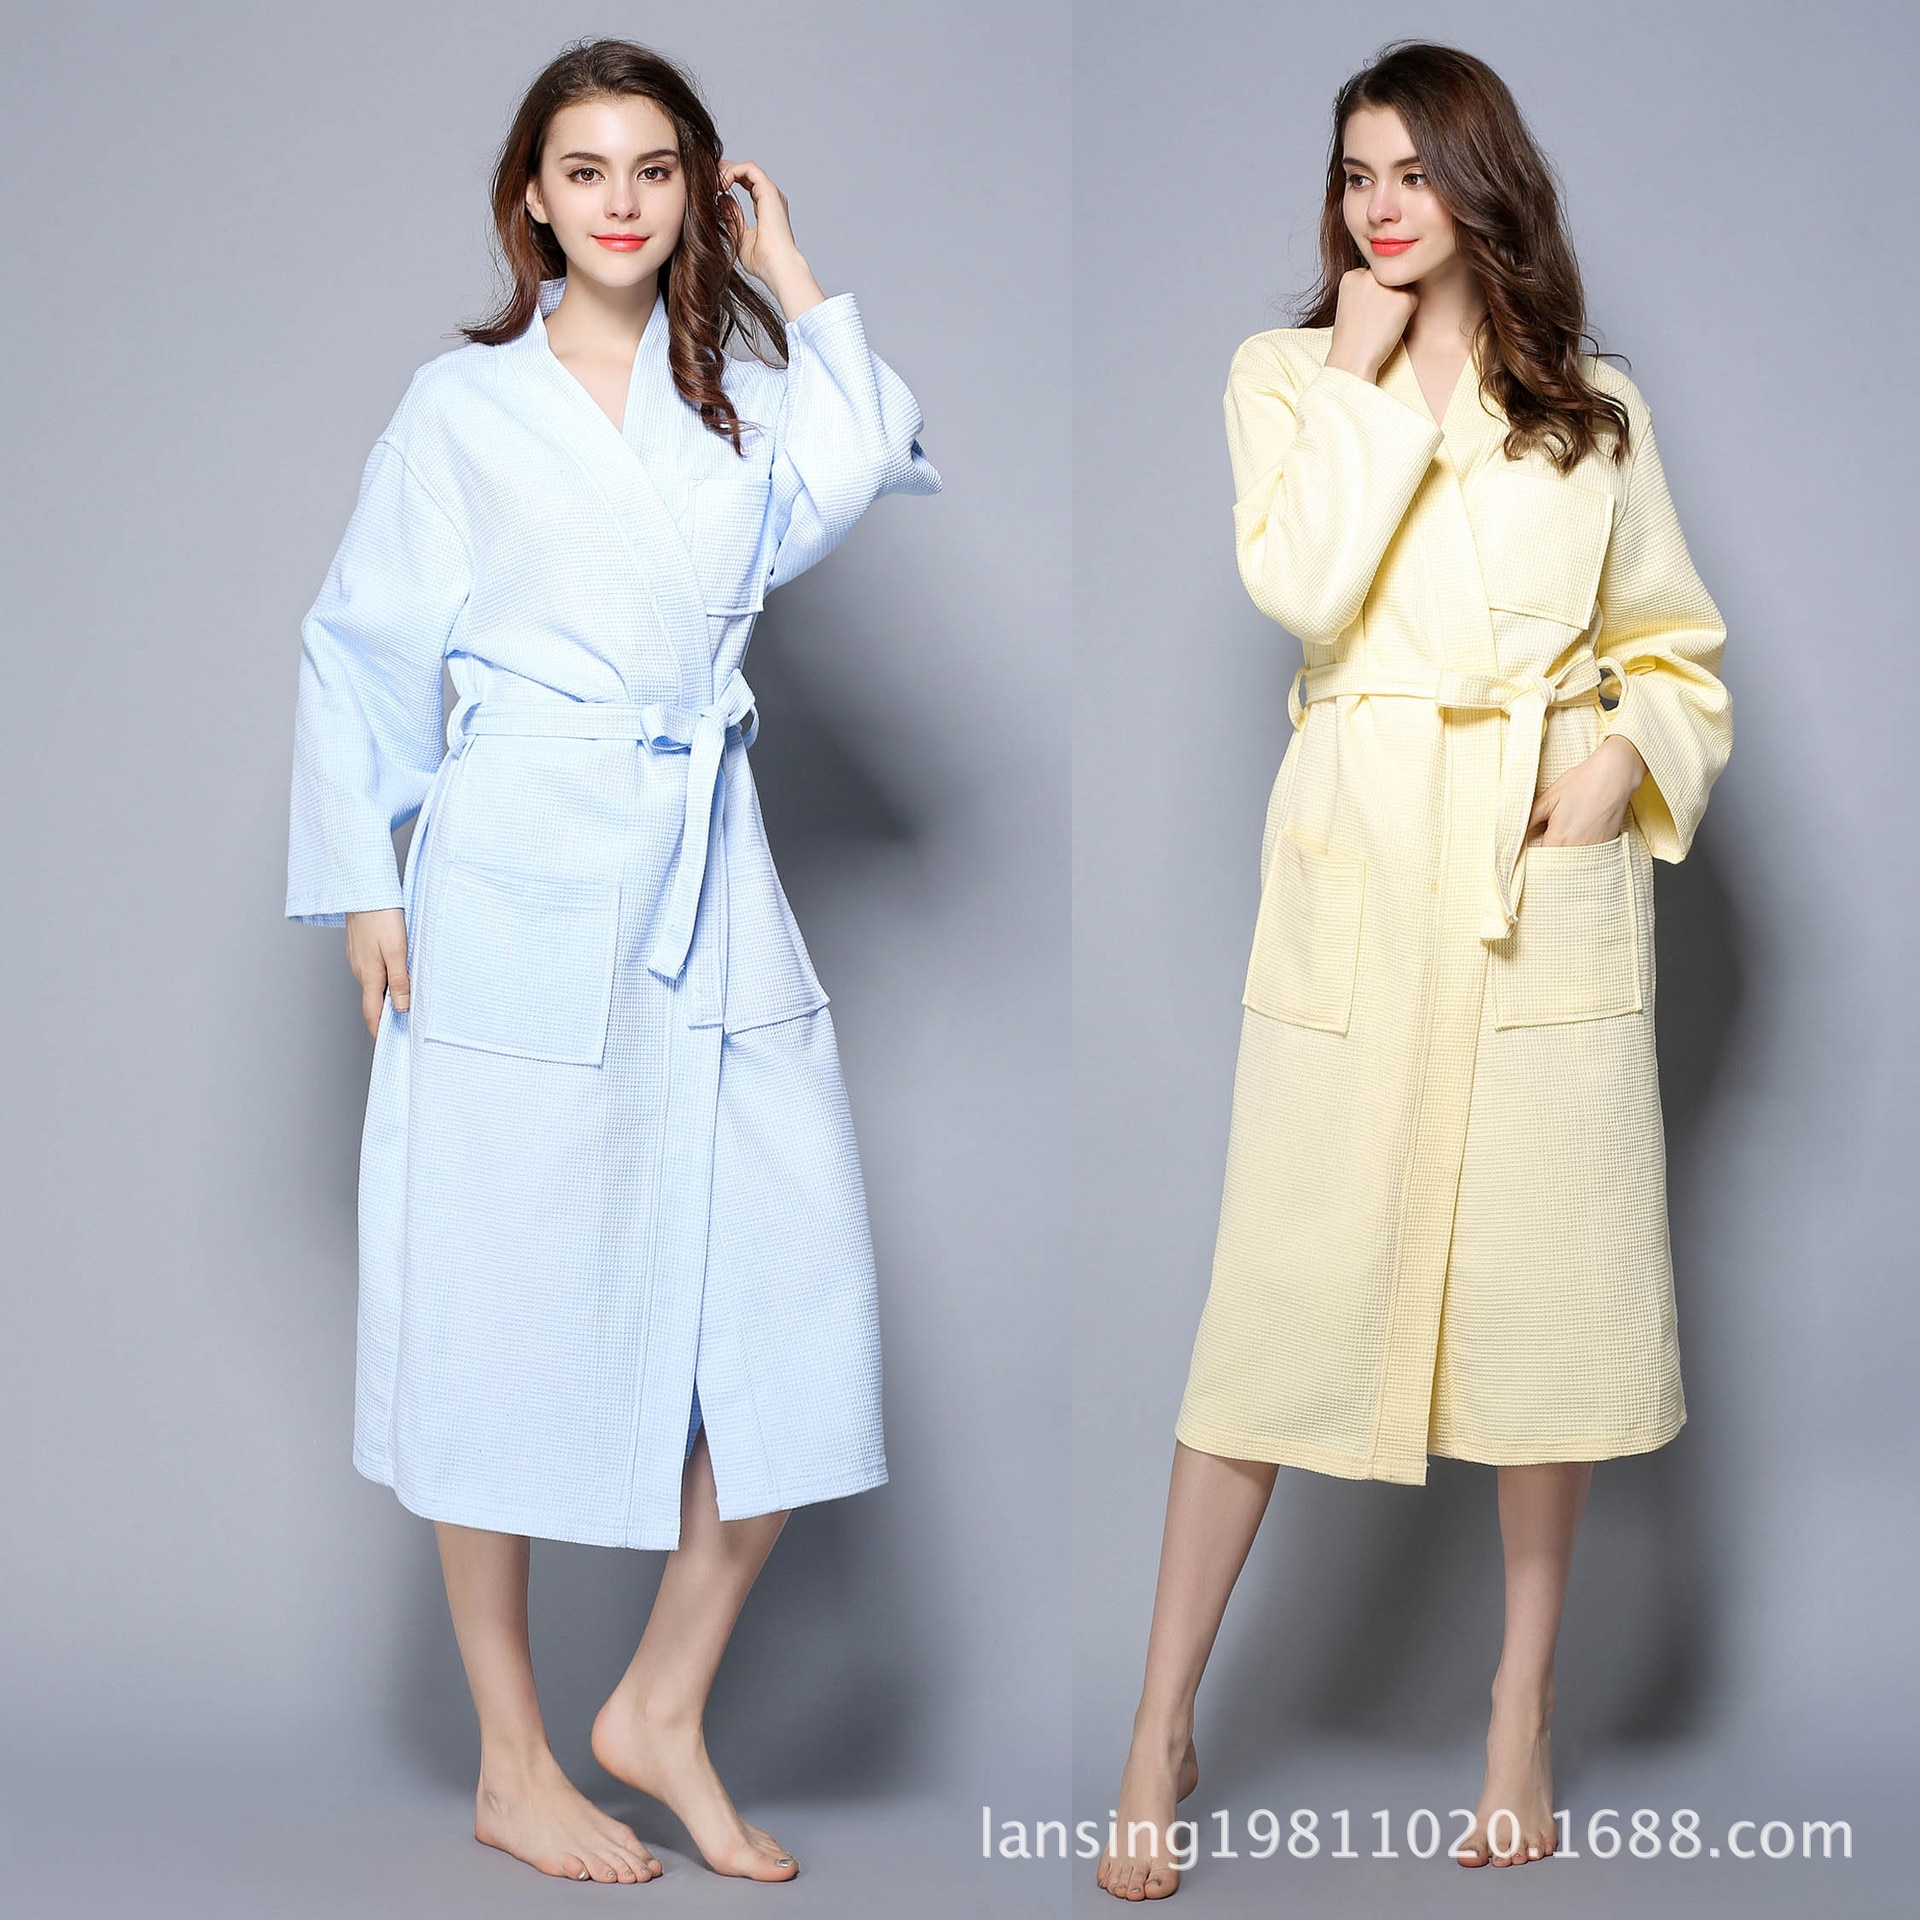 2020 nuevo Kimono Robe mujeres Albornoz algodón mujeres 60-100kg 1684